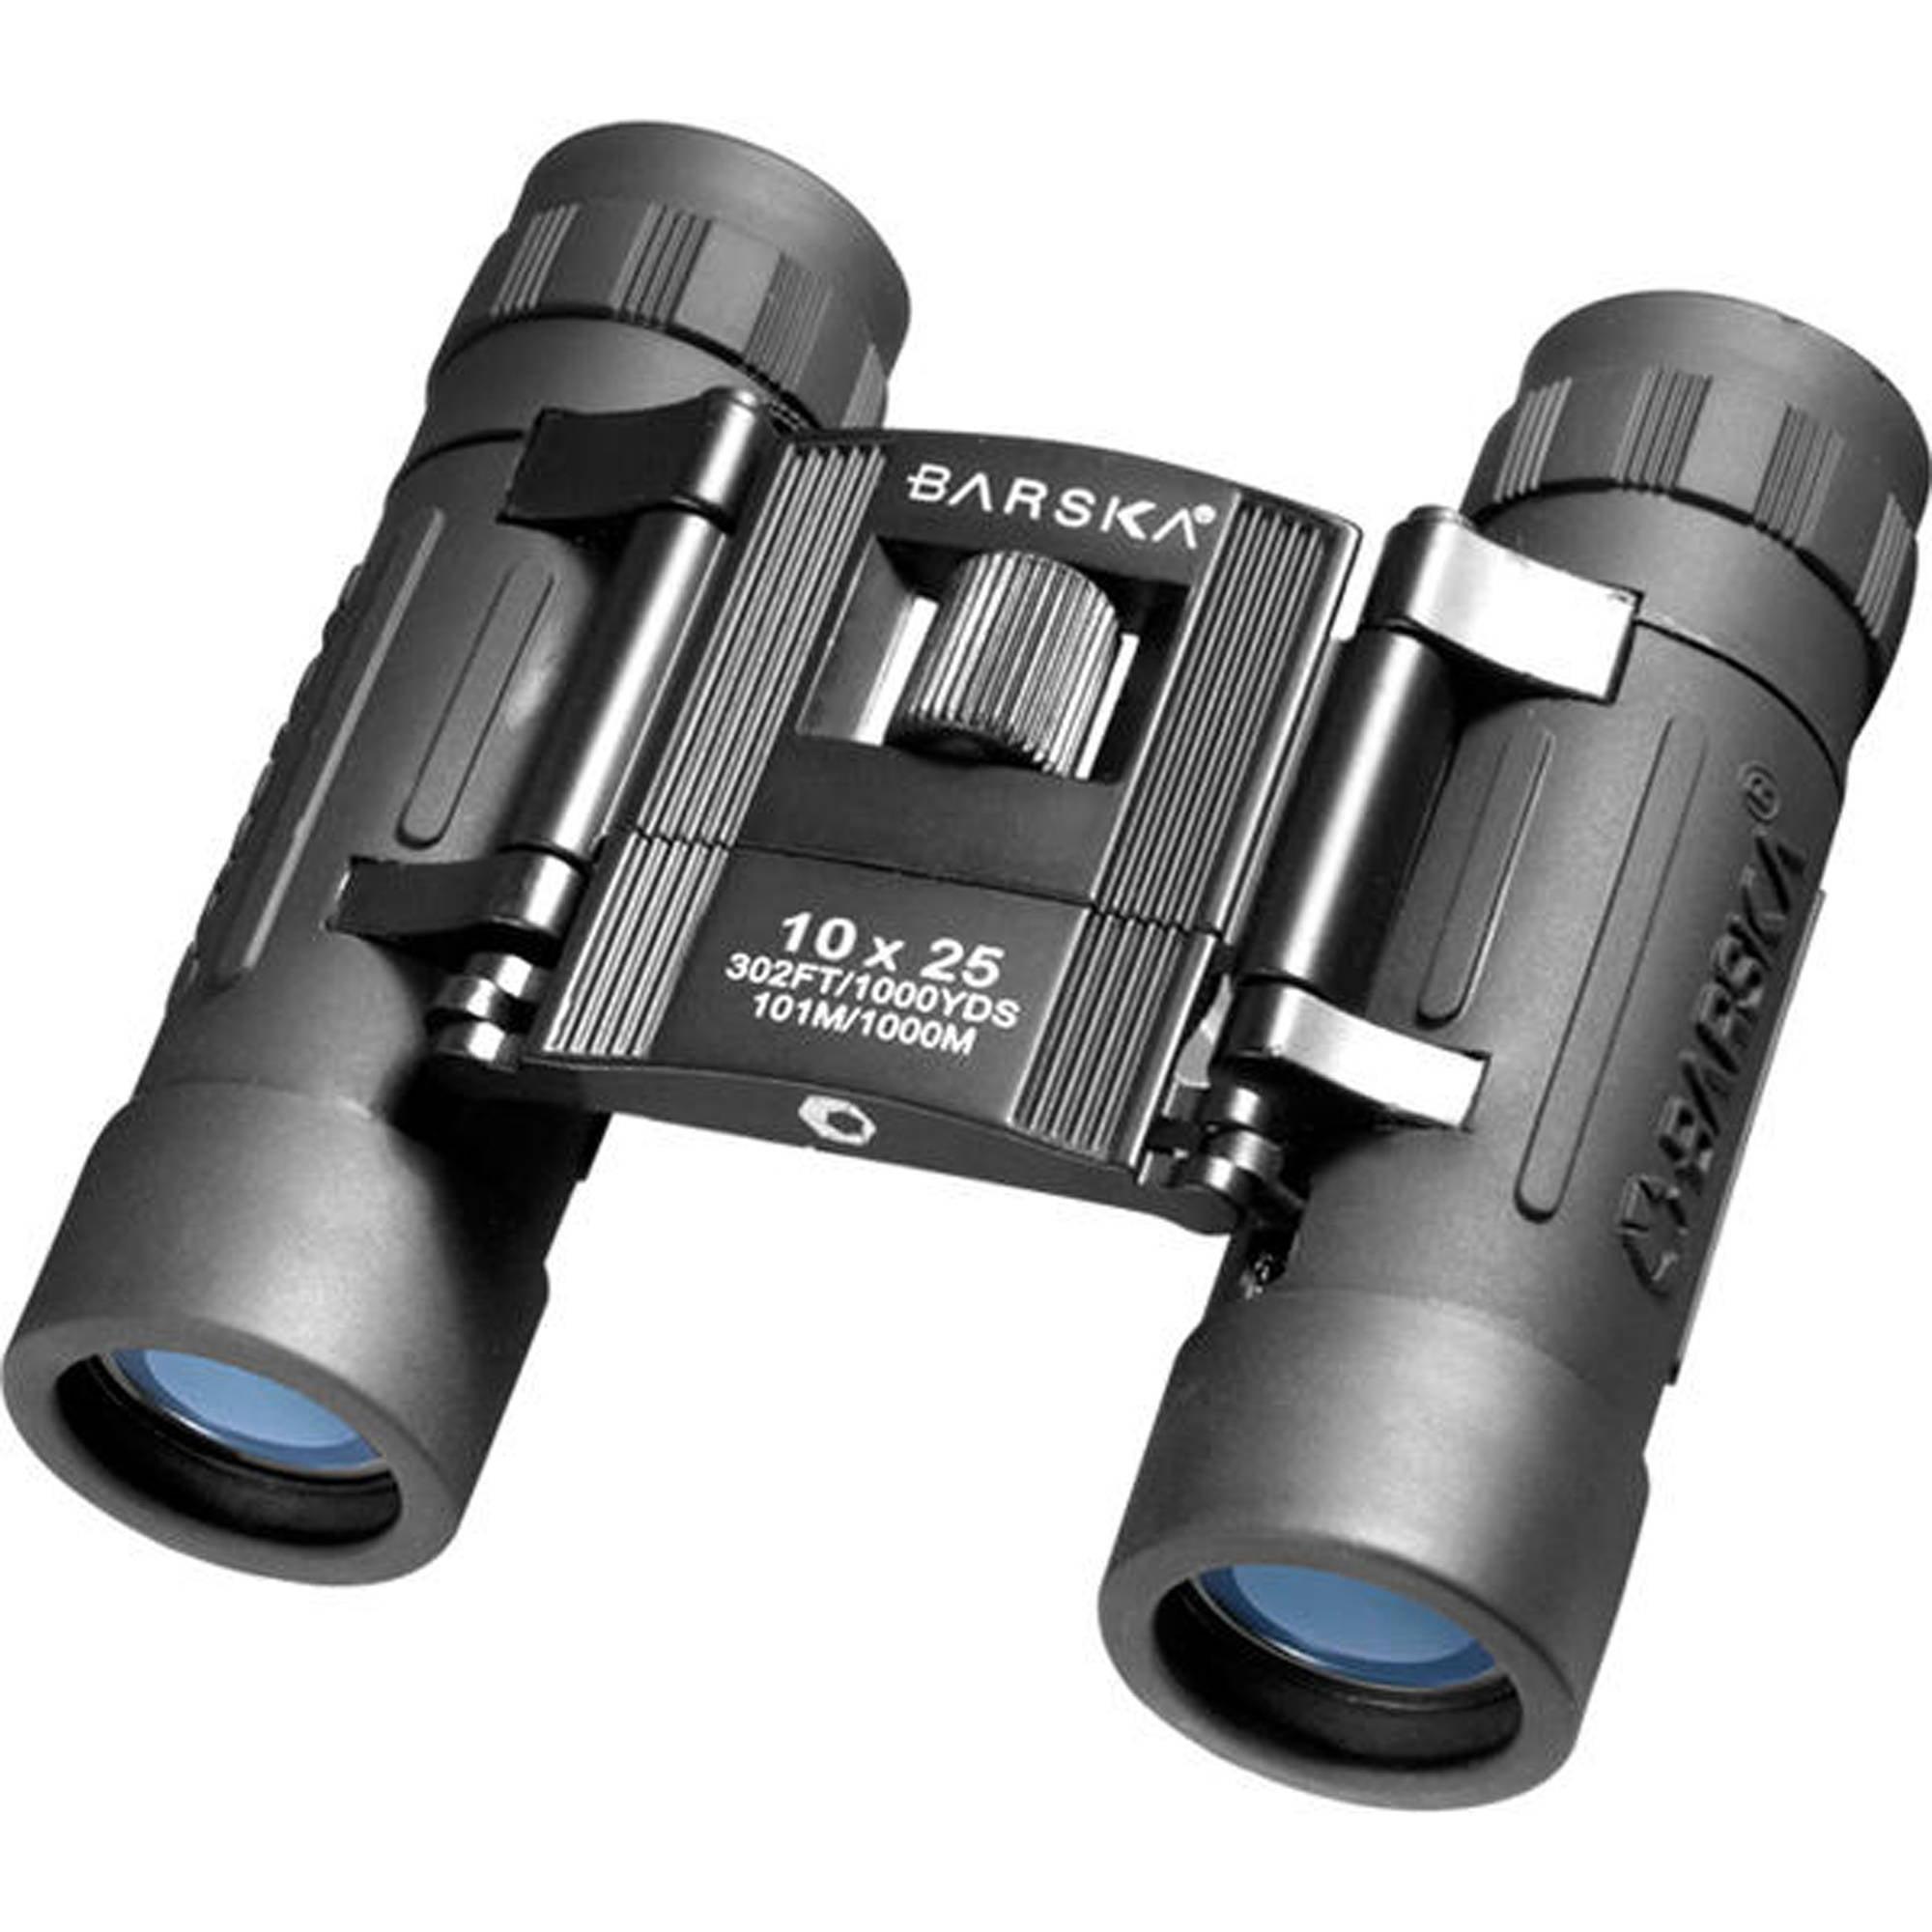 Barska Optics Lucid View Compact Binocular 10x25mm, Blue Lens by Barska